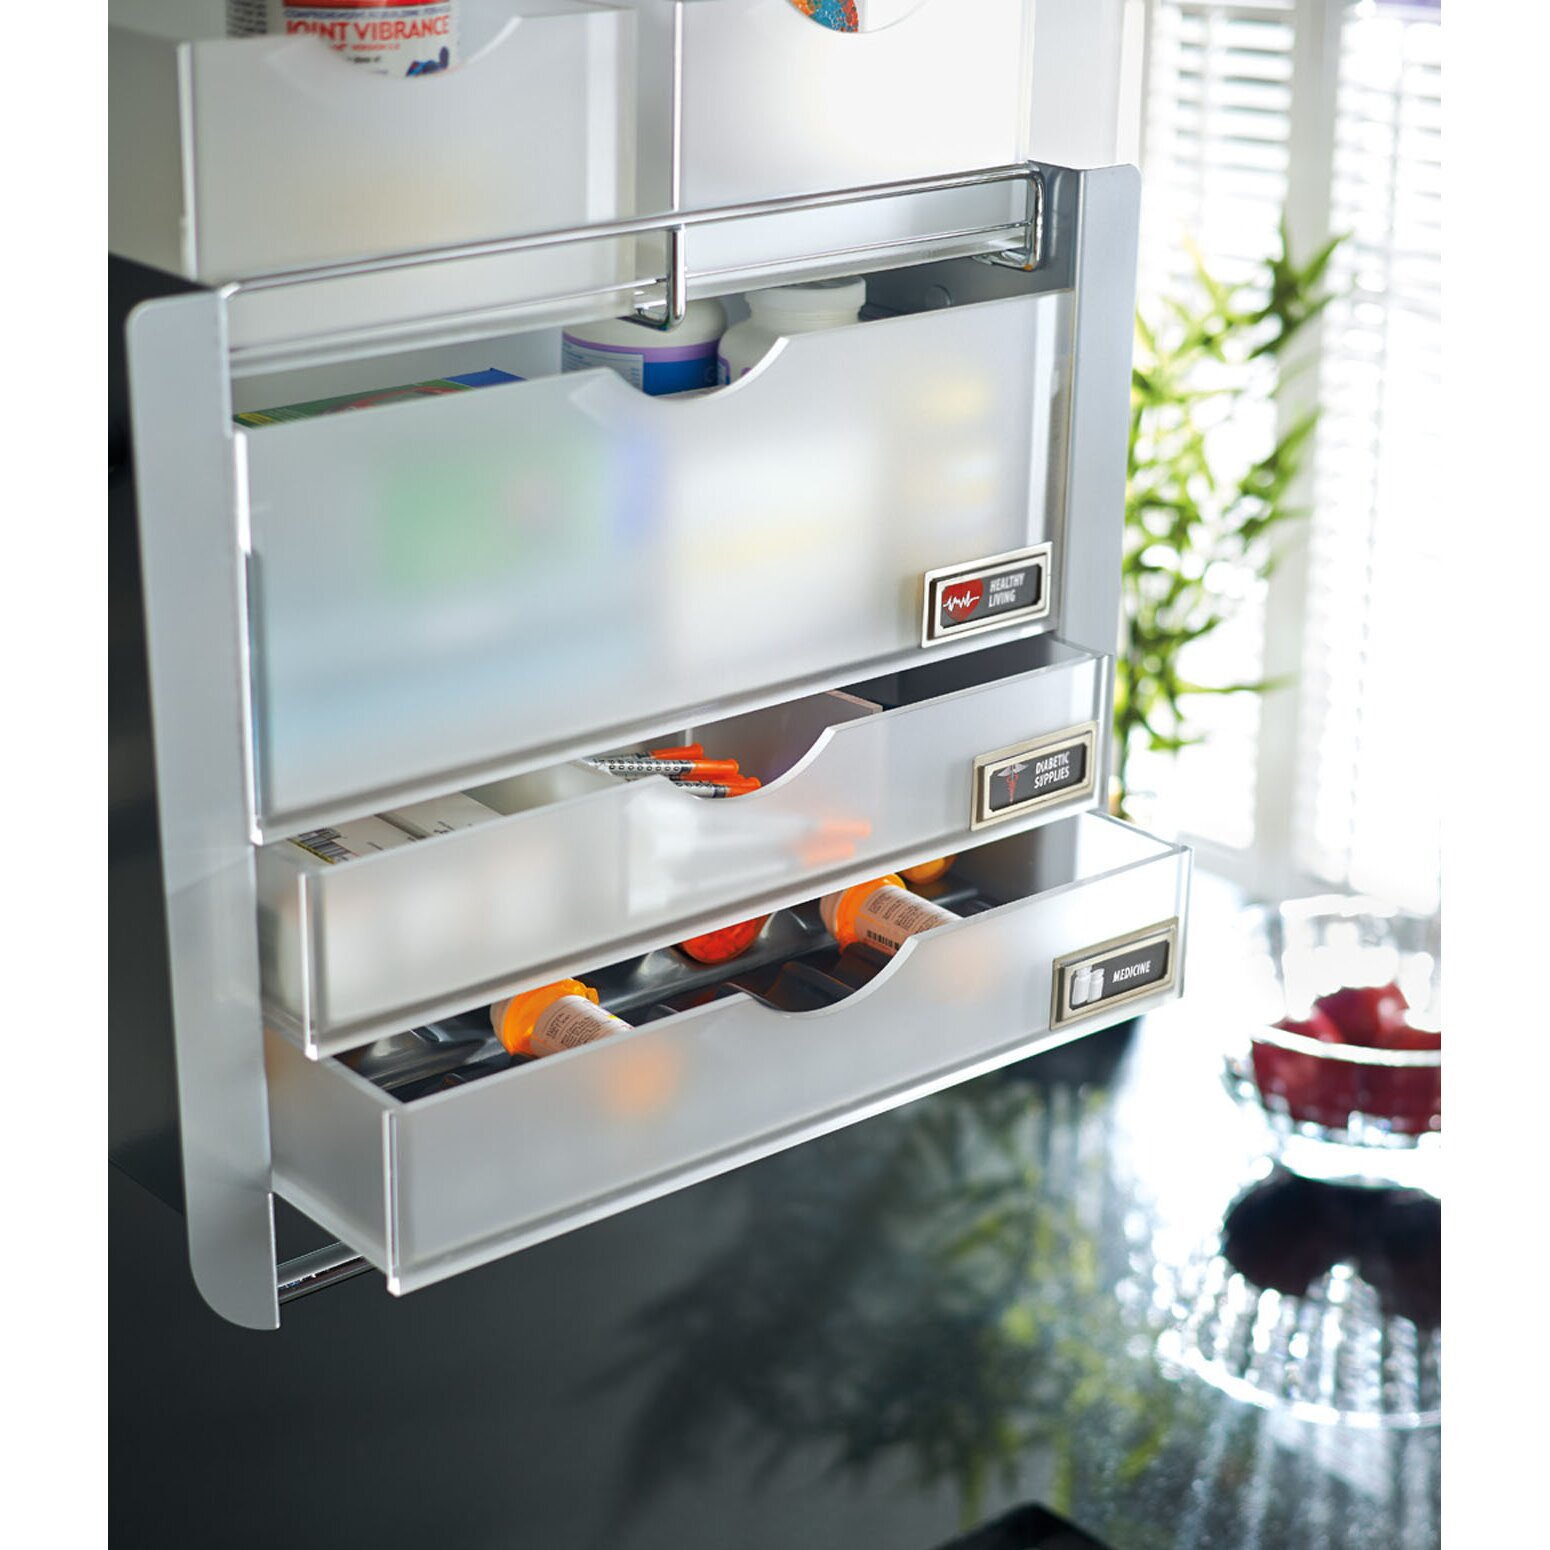 Rev-A-Shelf Universal Wall Cabinet Pull-Down Shelving